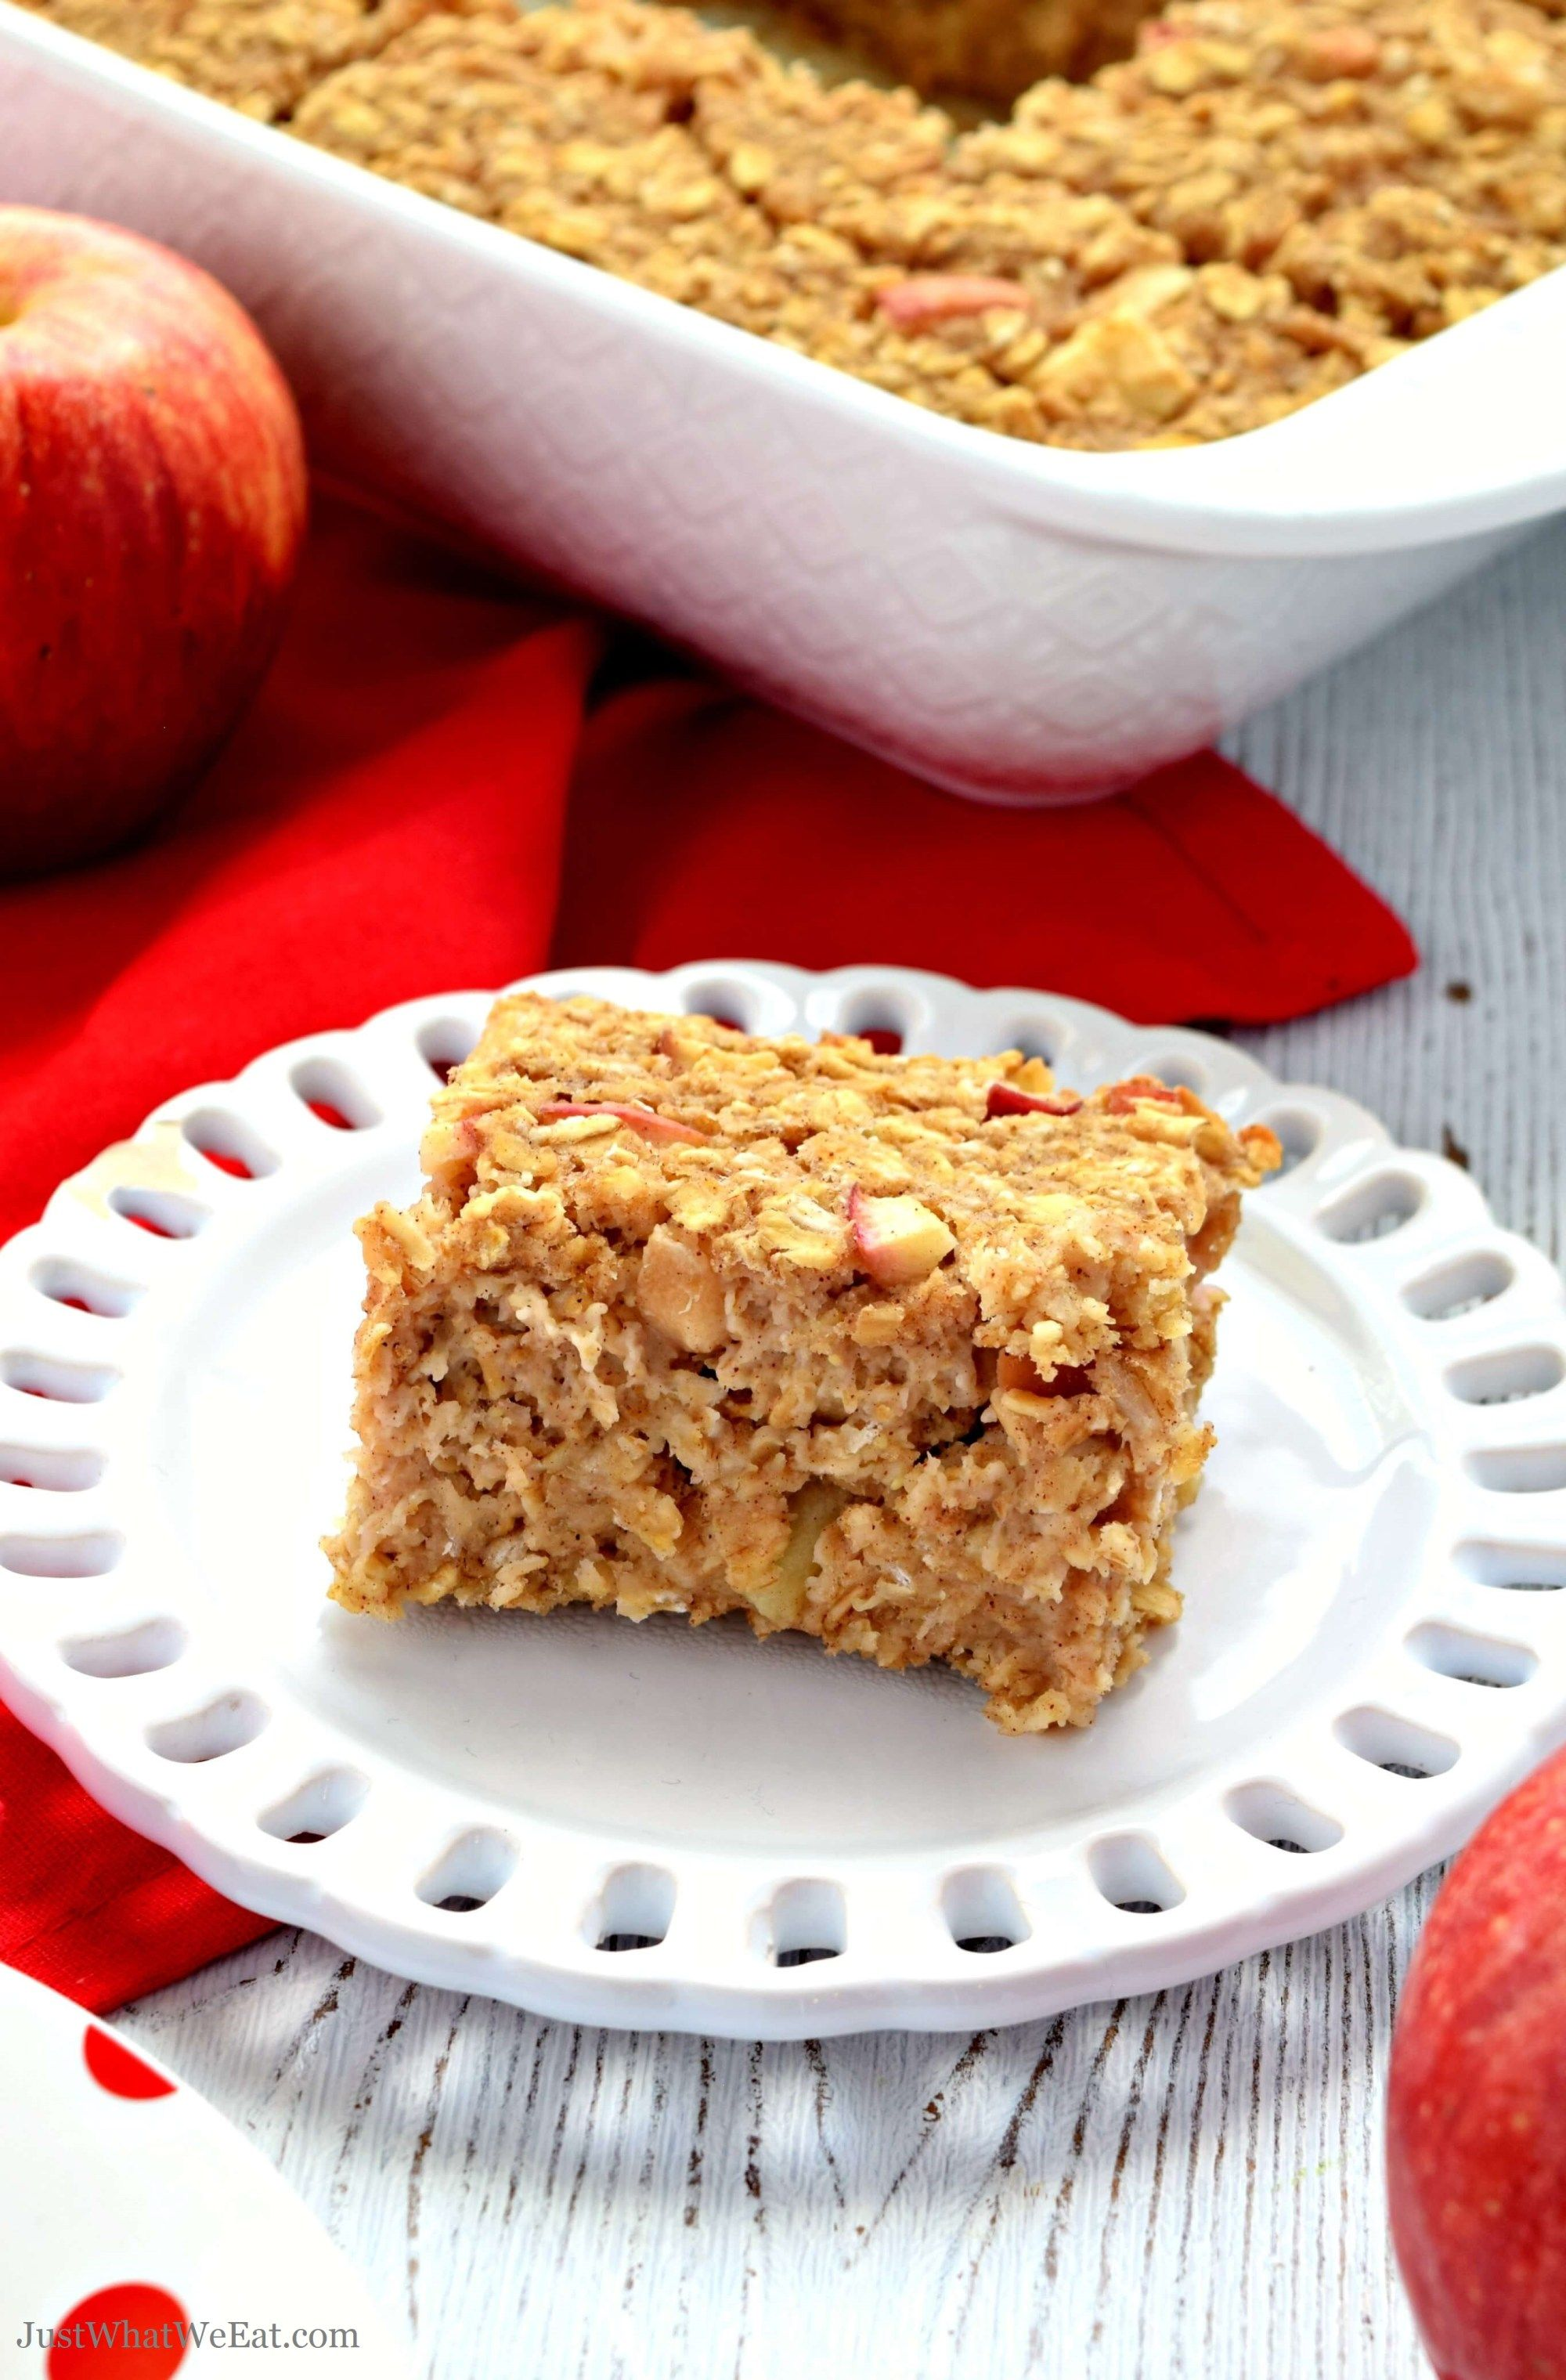 Apple cinnamon baked oatmeal gluten free vegan refined